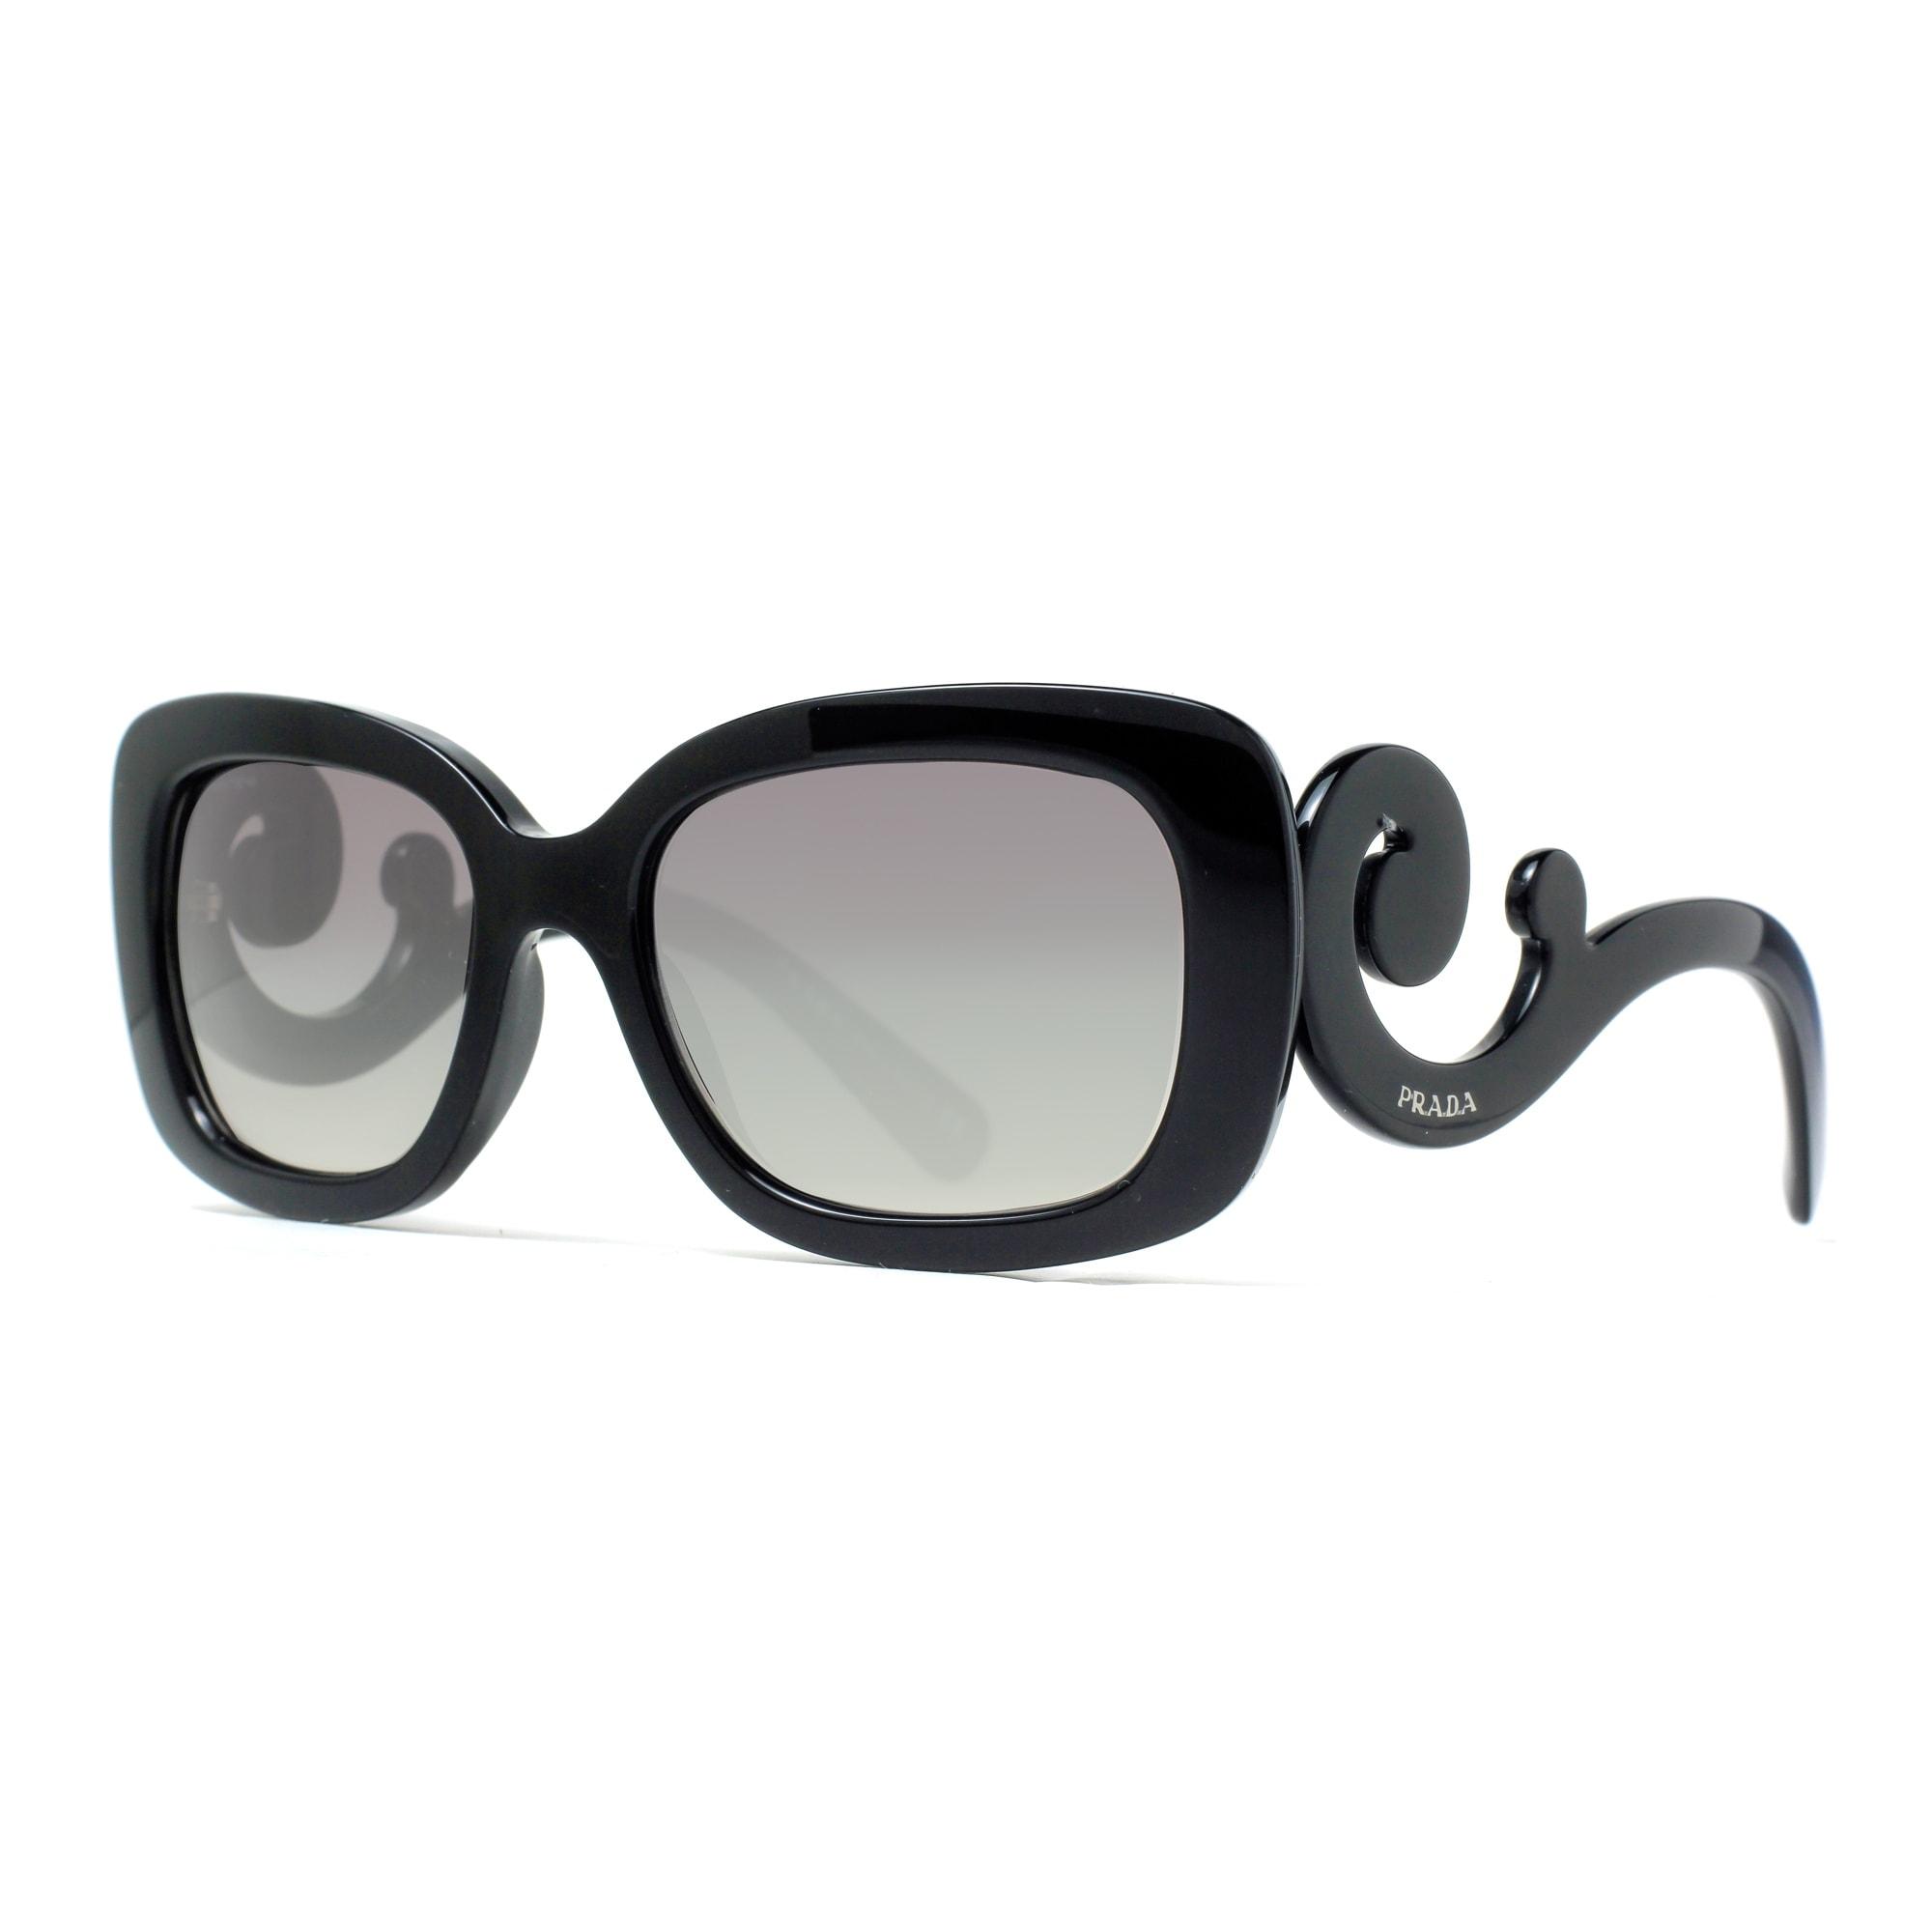 0bb918aa7a78a ... sweden shop prada spr 27o 1ab 3m1 black gray gradient womens baroque  square sunglasses black 54mm